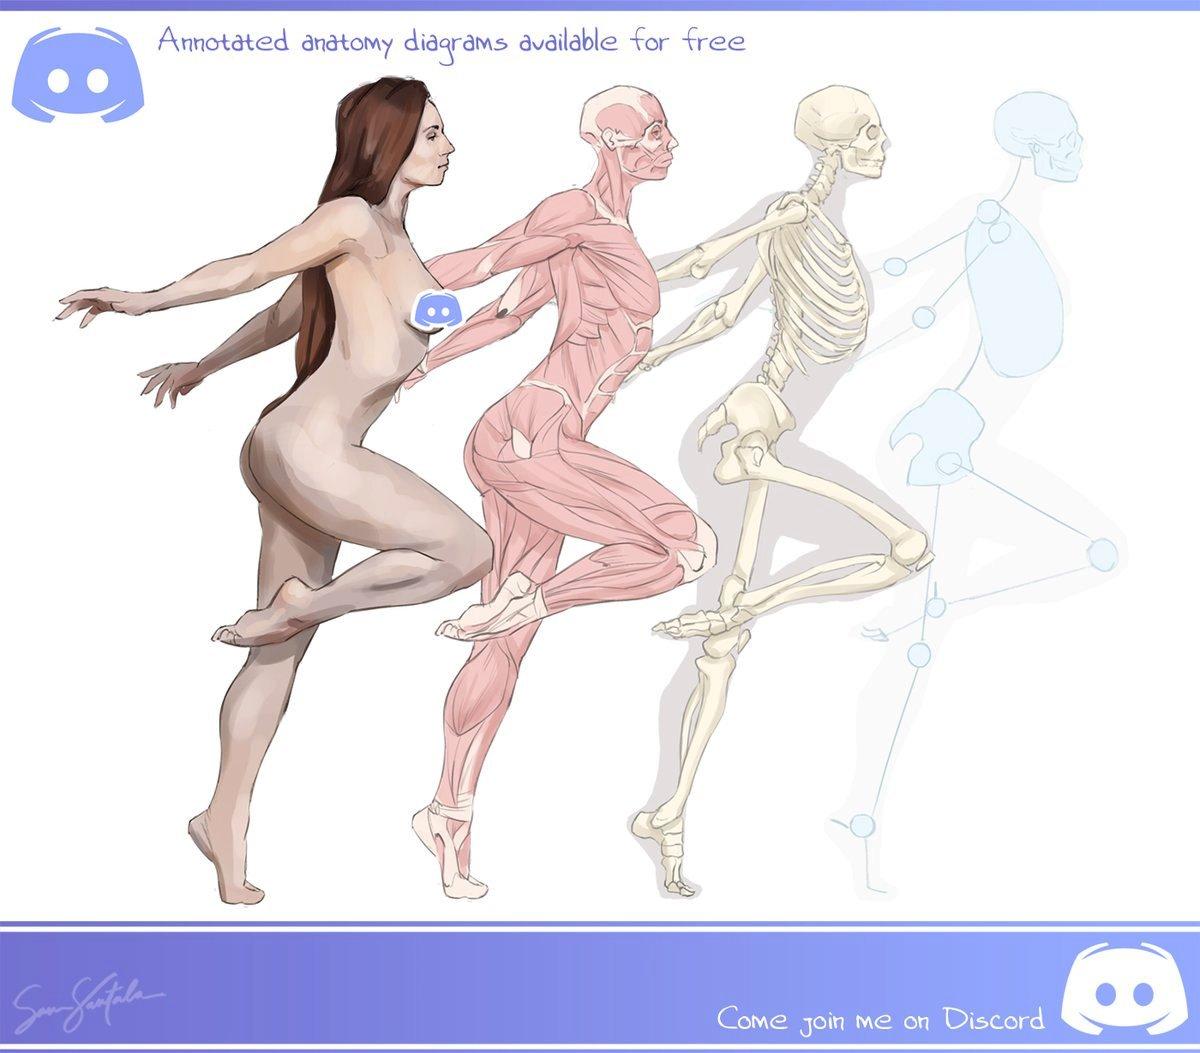 Anatomy For Art Anatomyforart Twitter